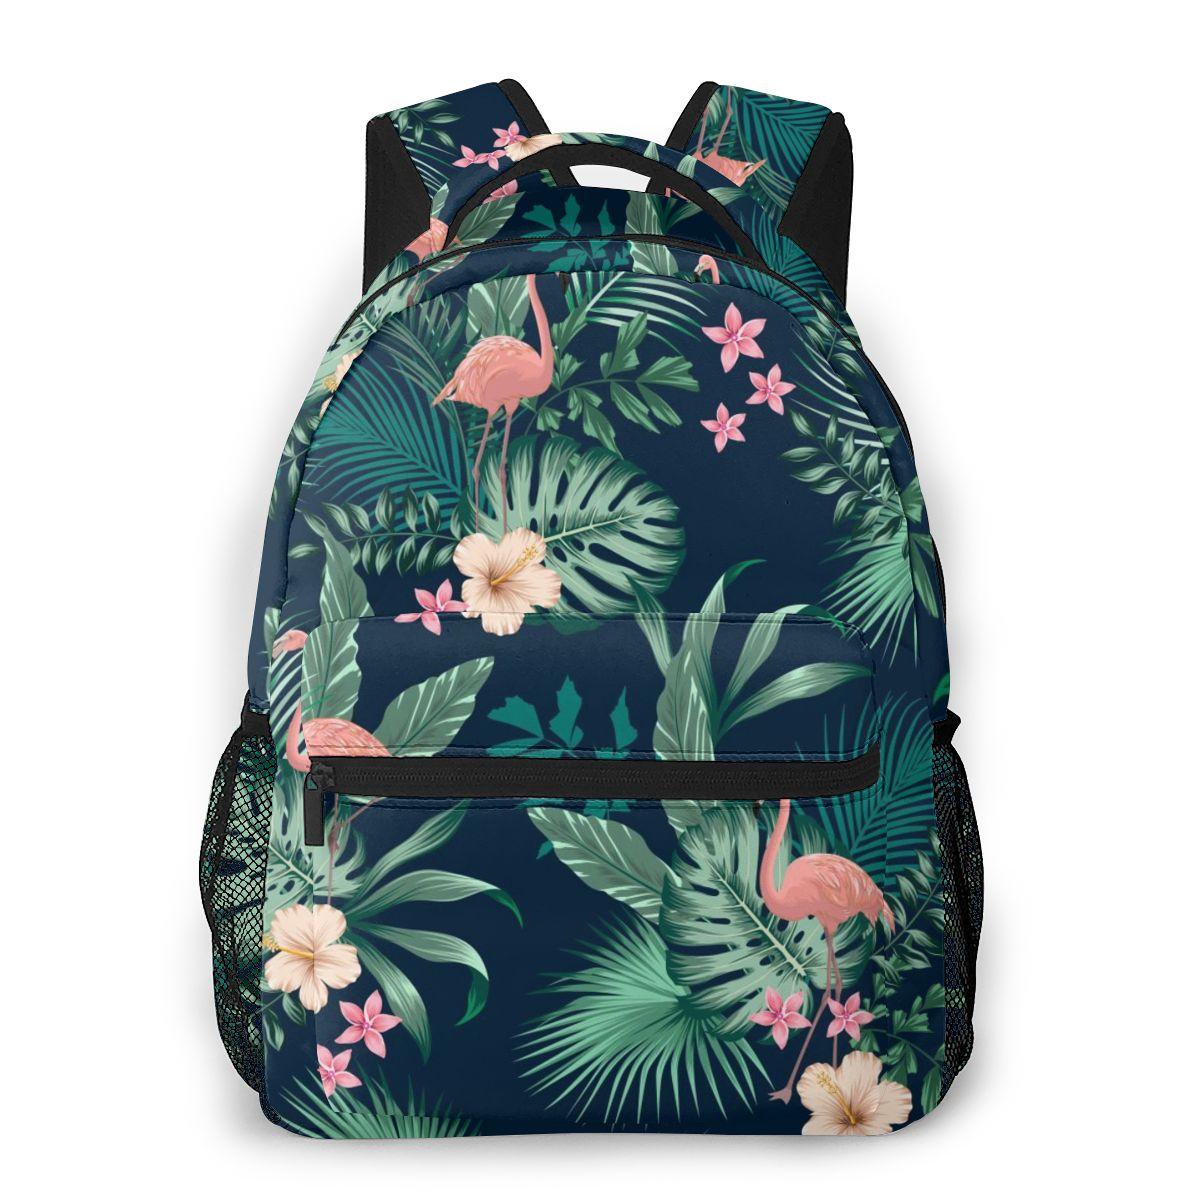 OLN-حقيبة ظهر متعددة الأغراض للنساء ، حقيبة مدرسية ، أوراق الشجر الاستوائية ، الزهور والفلامنجو ، حقيبة سفر للبنات